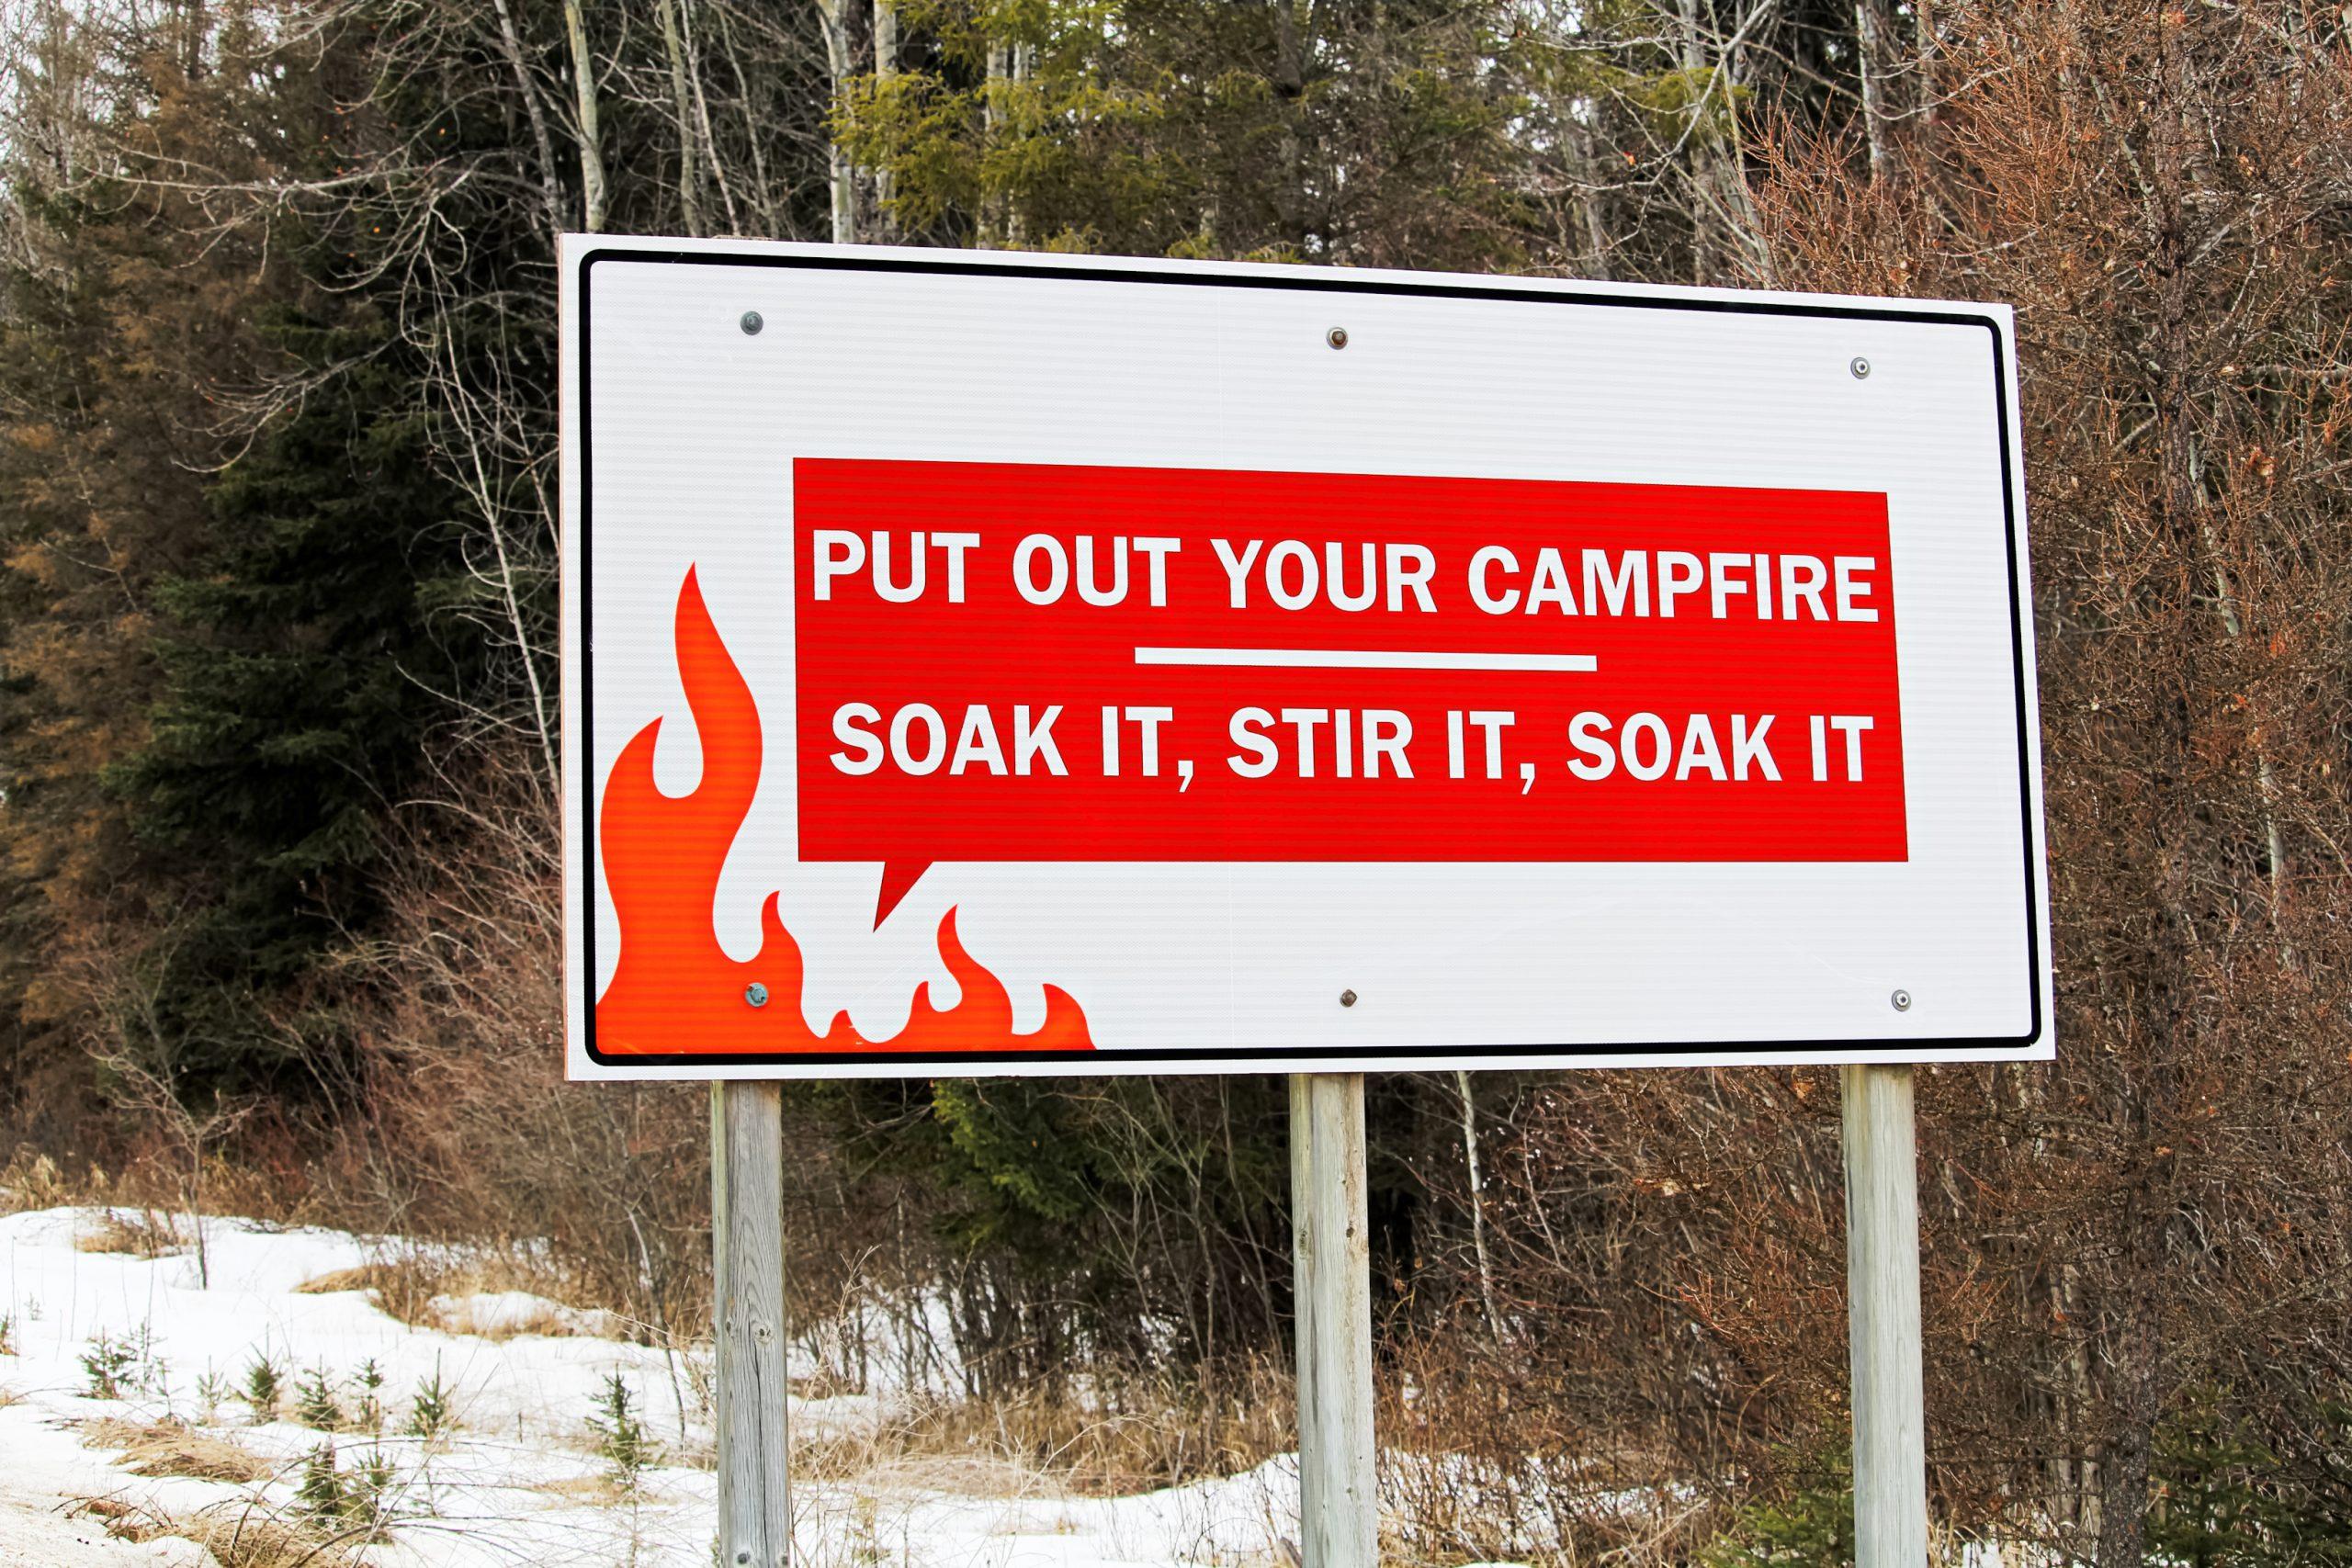 Campfire Warning Message